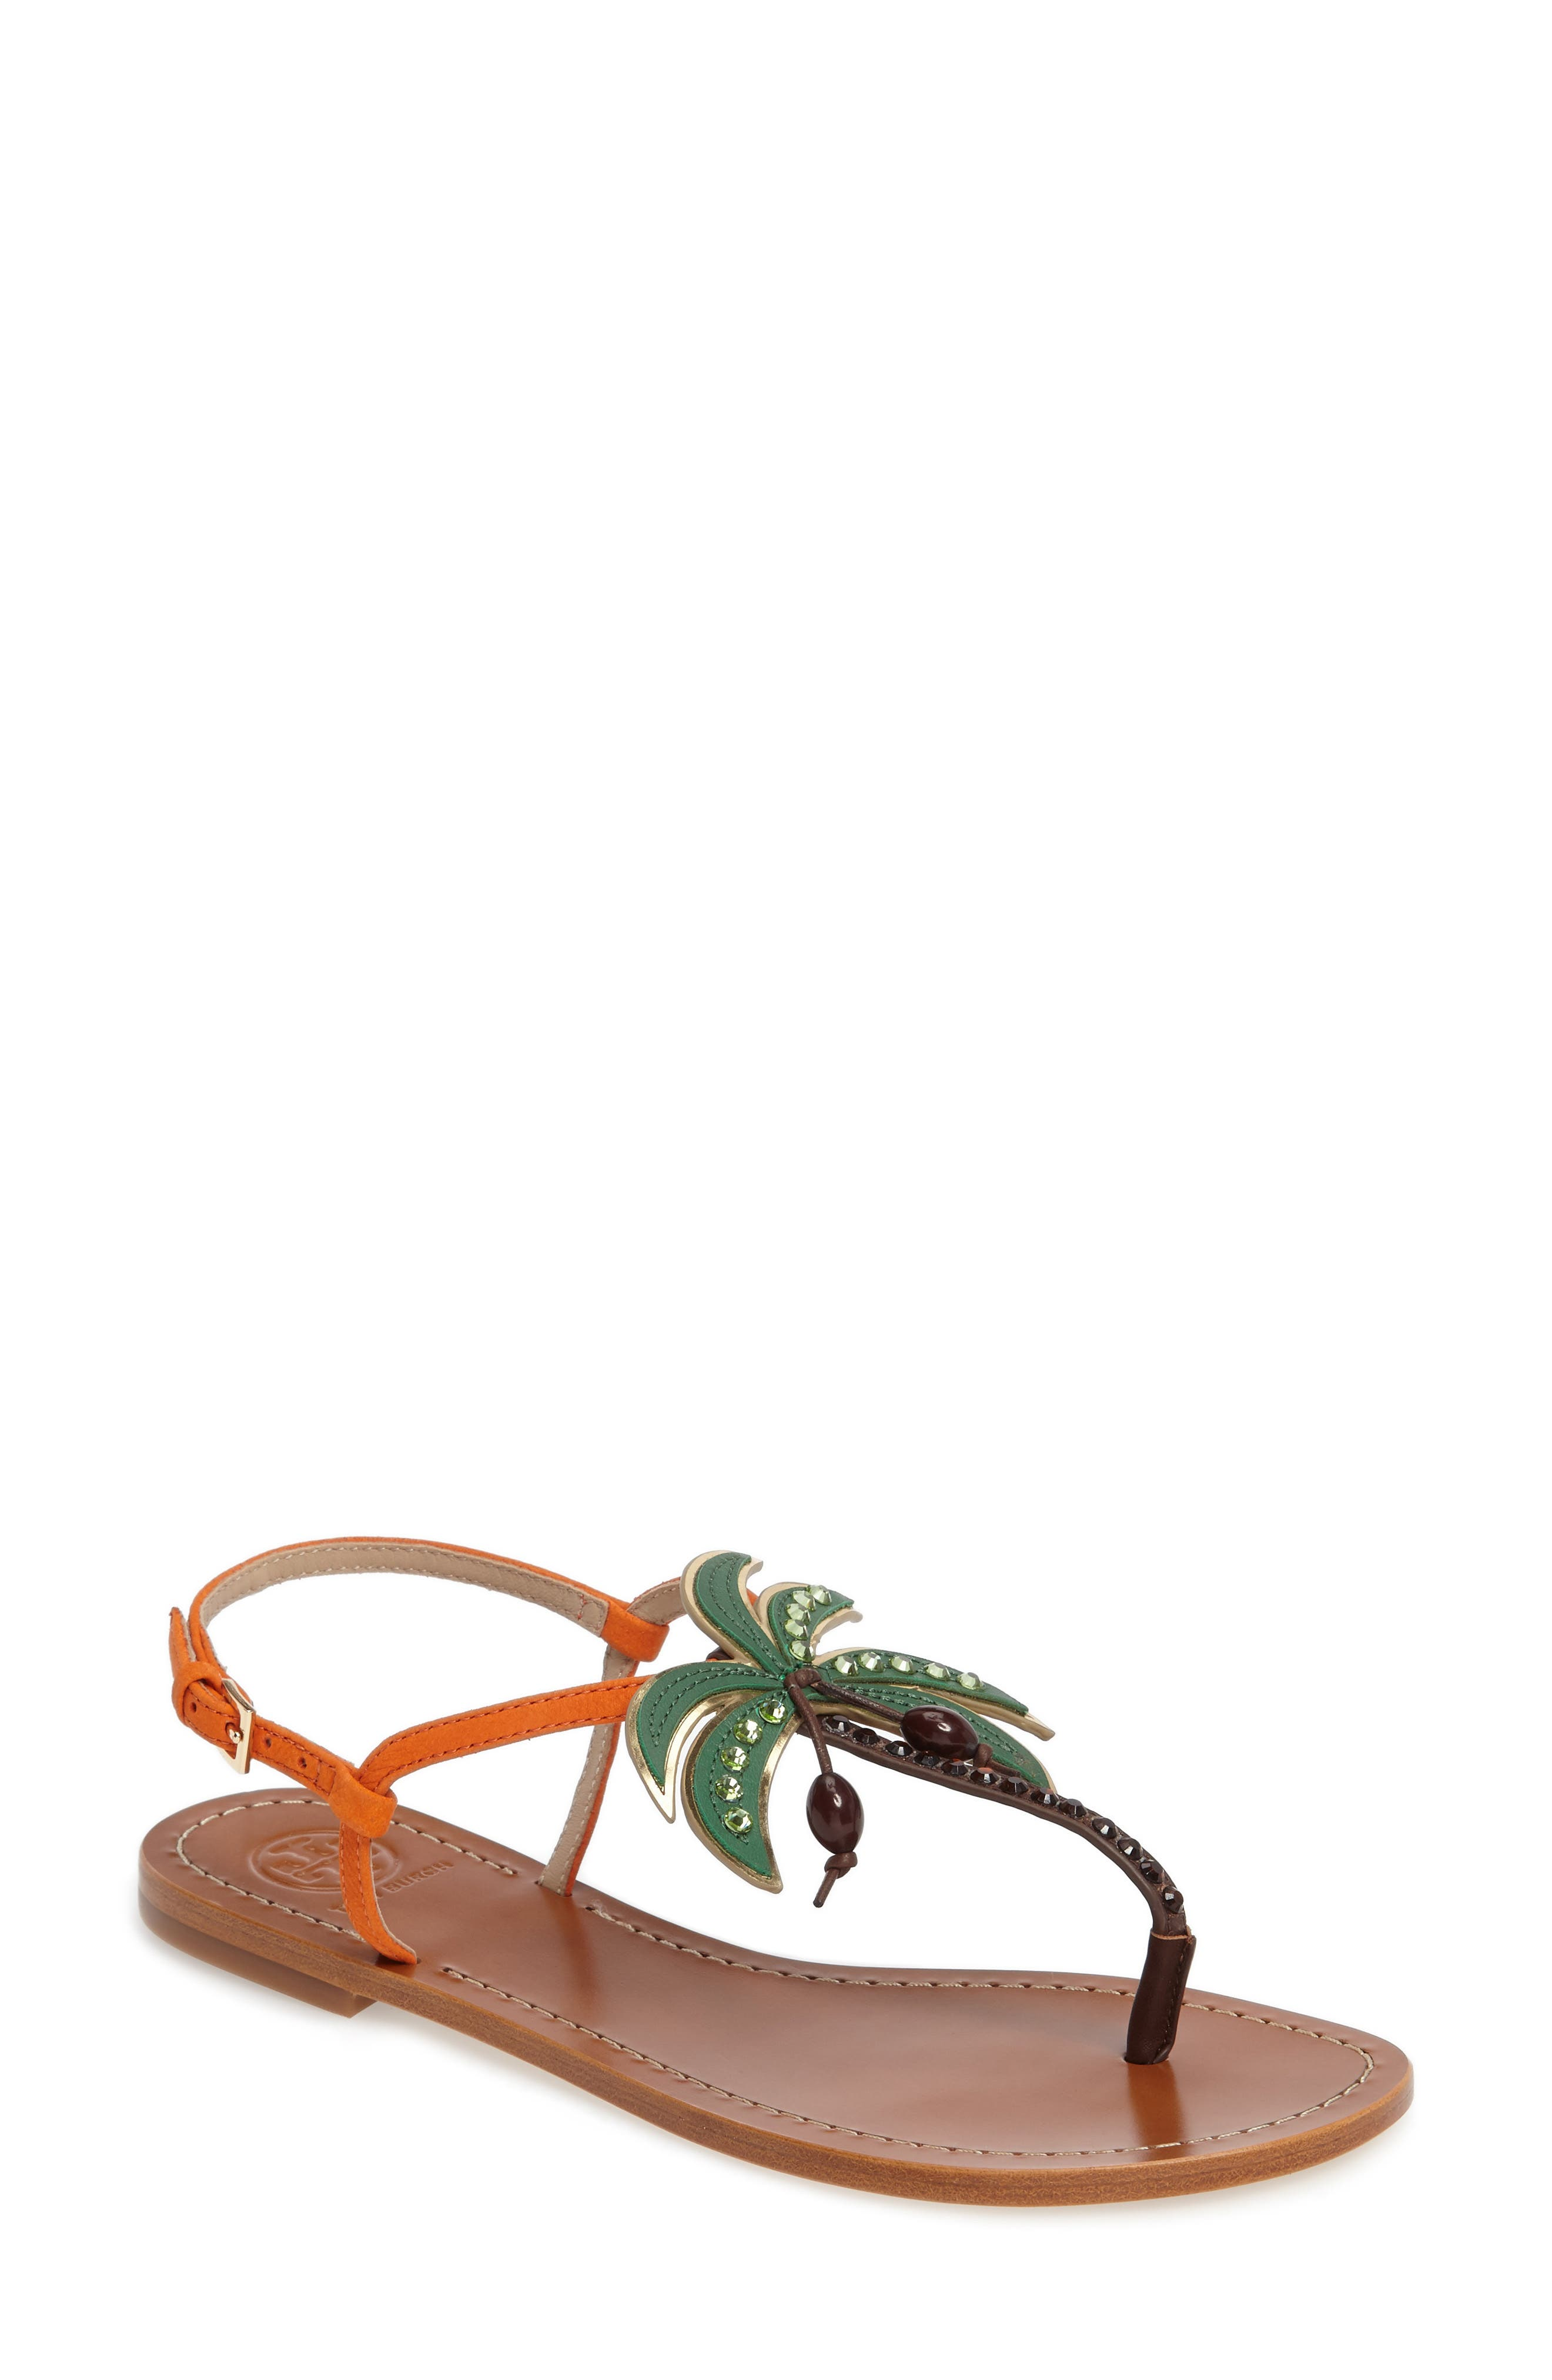 Main Image - Tory Burch Castaway Embellished Palm Tree Sandal (Women)